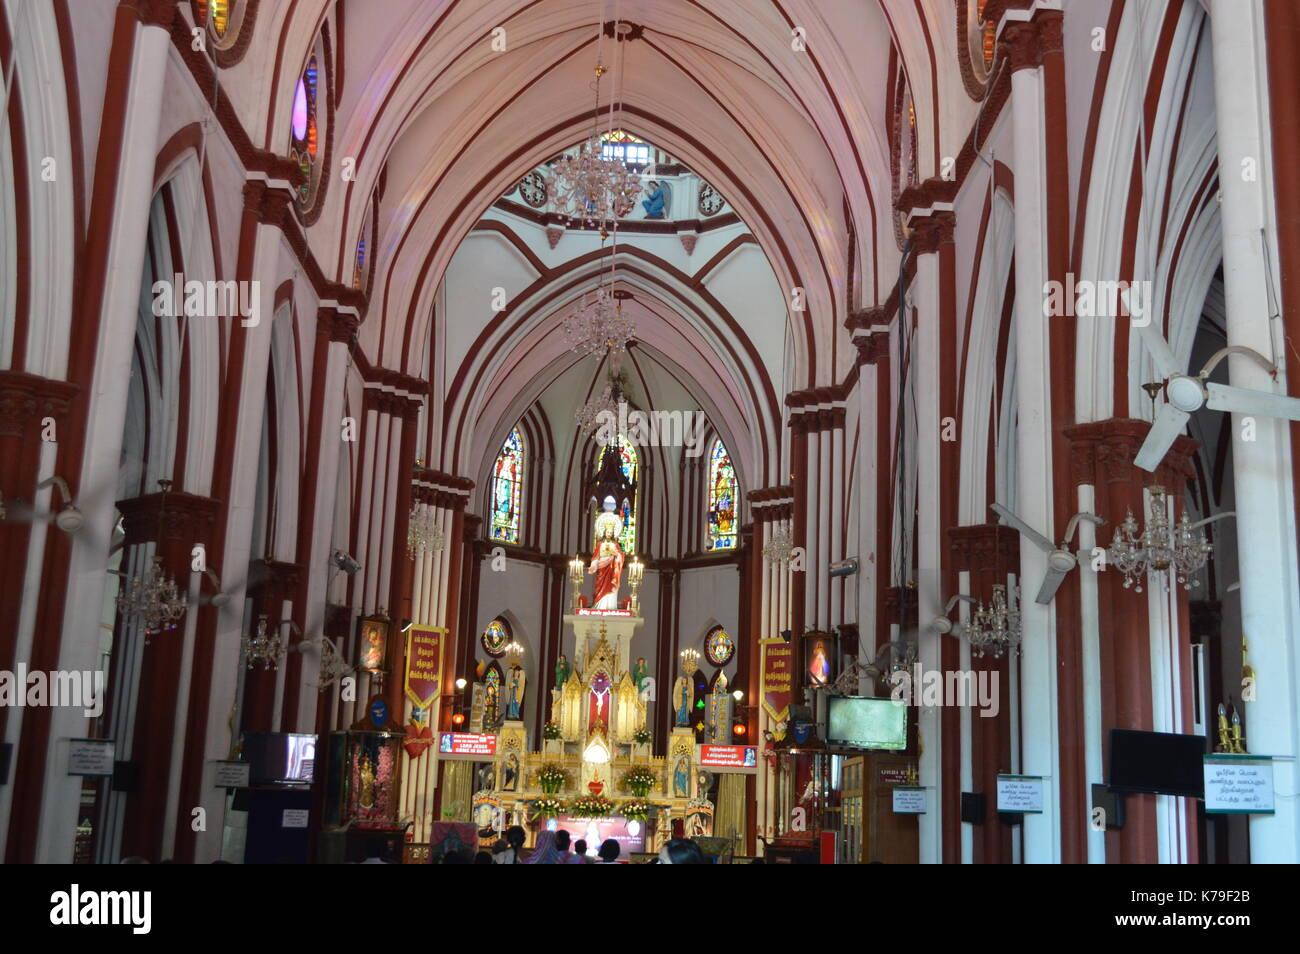 Basilica of the Sacred Heart of Jesus, Pondicherry - Stock Image